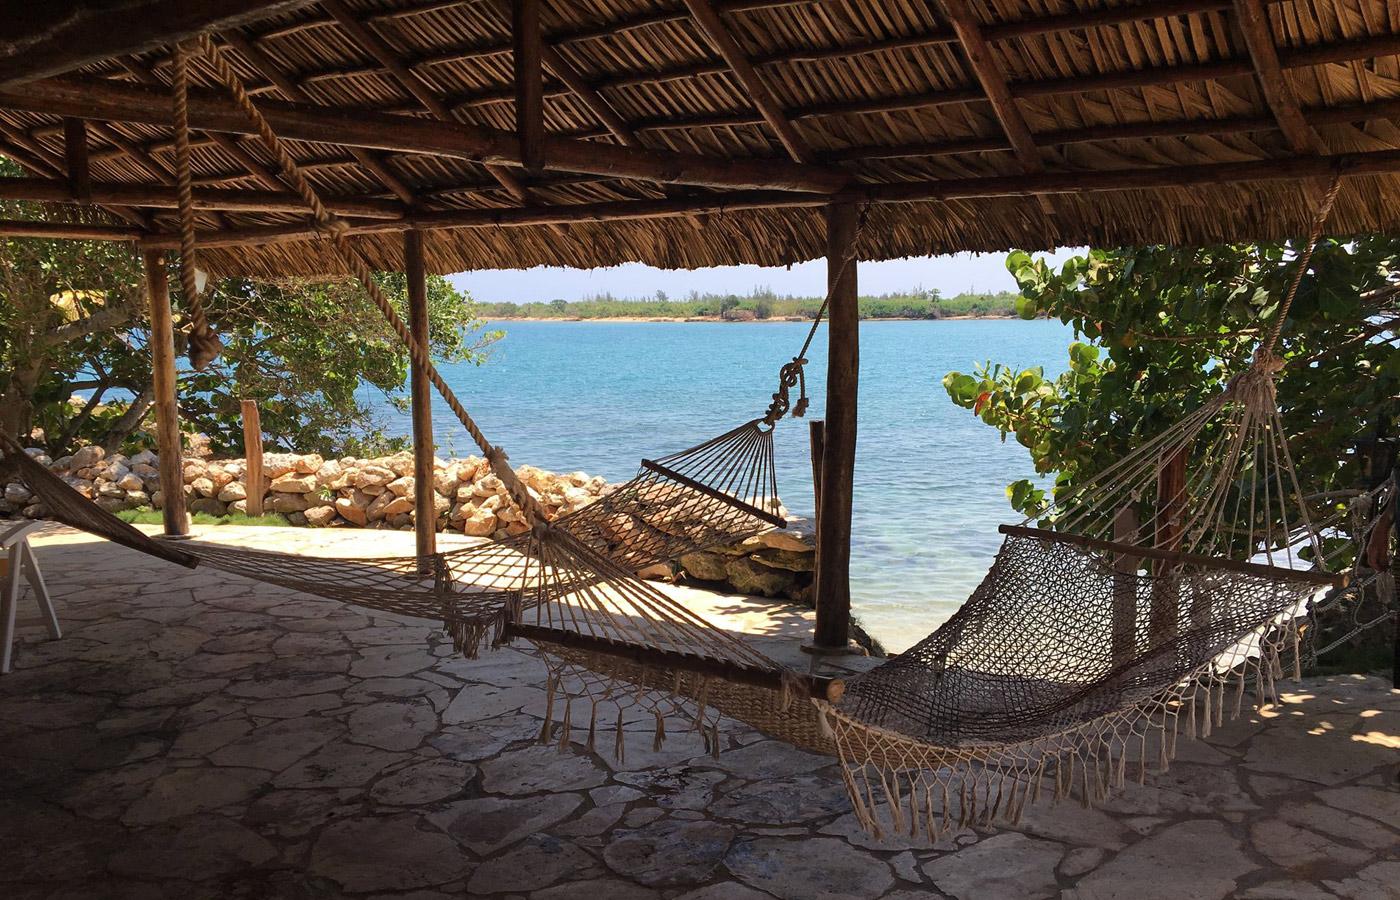 Relaxing hammocks at Banes Beach outside of Havana, Cuba